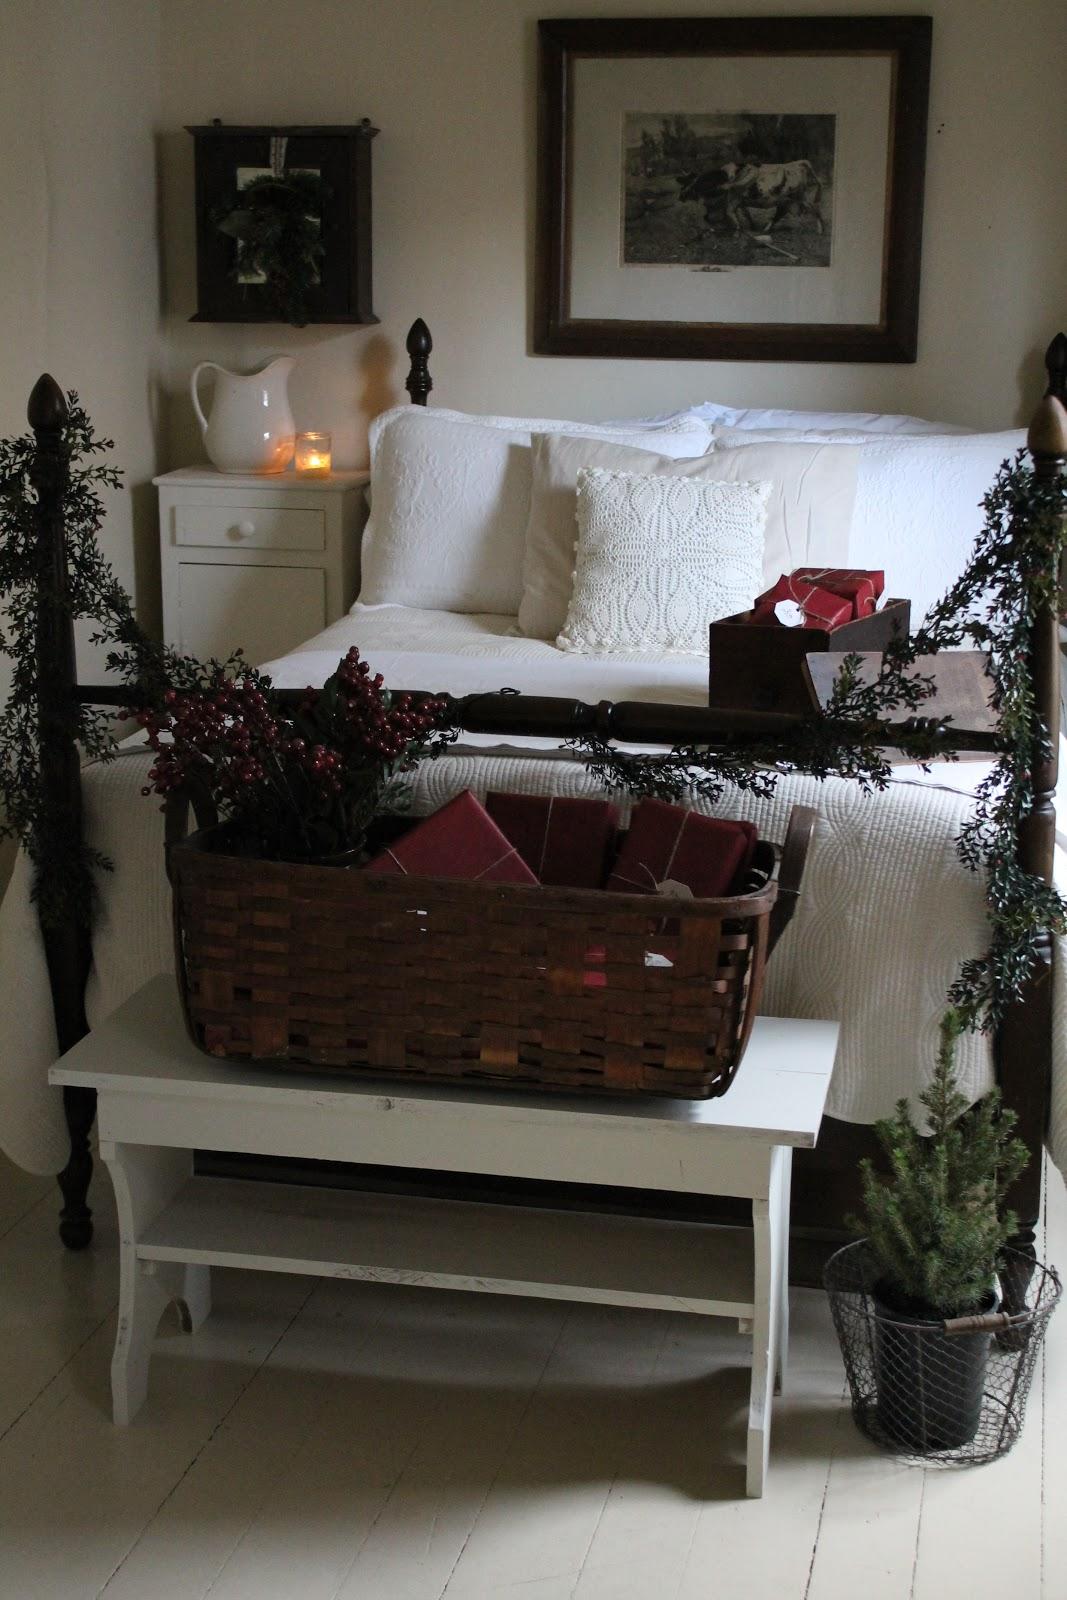 FARMHOUSE 5540: Christmas Guest Bedroom